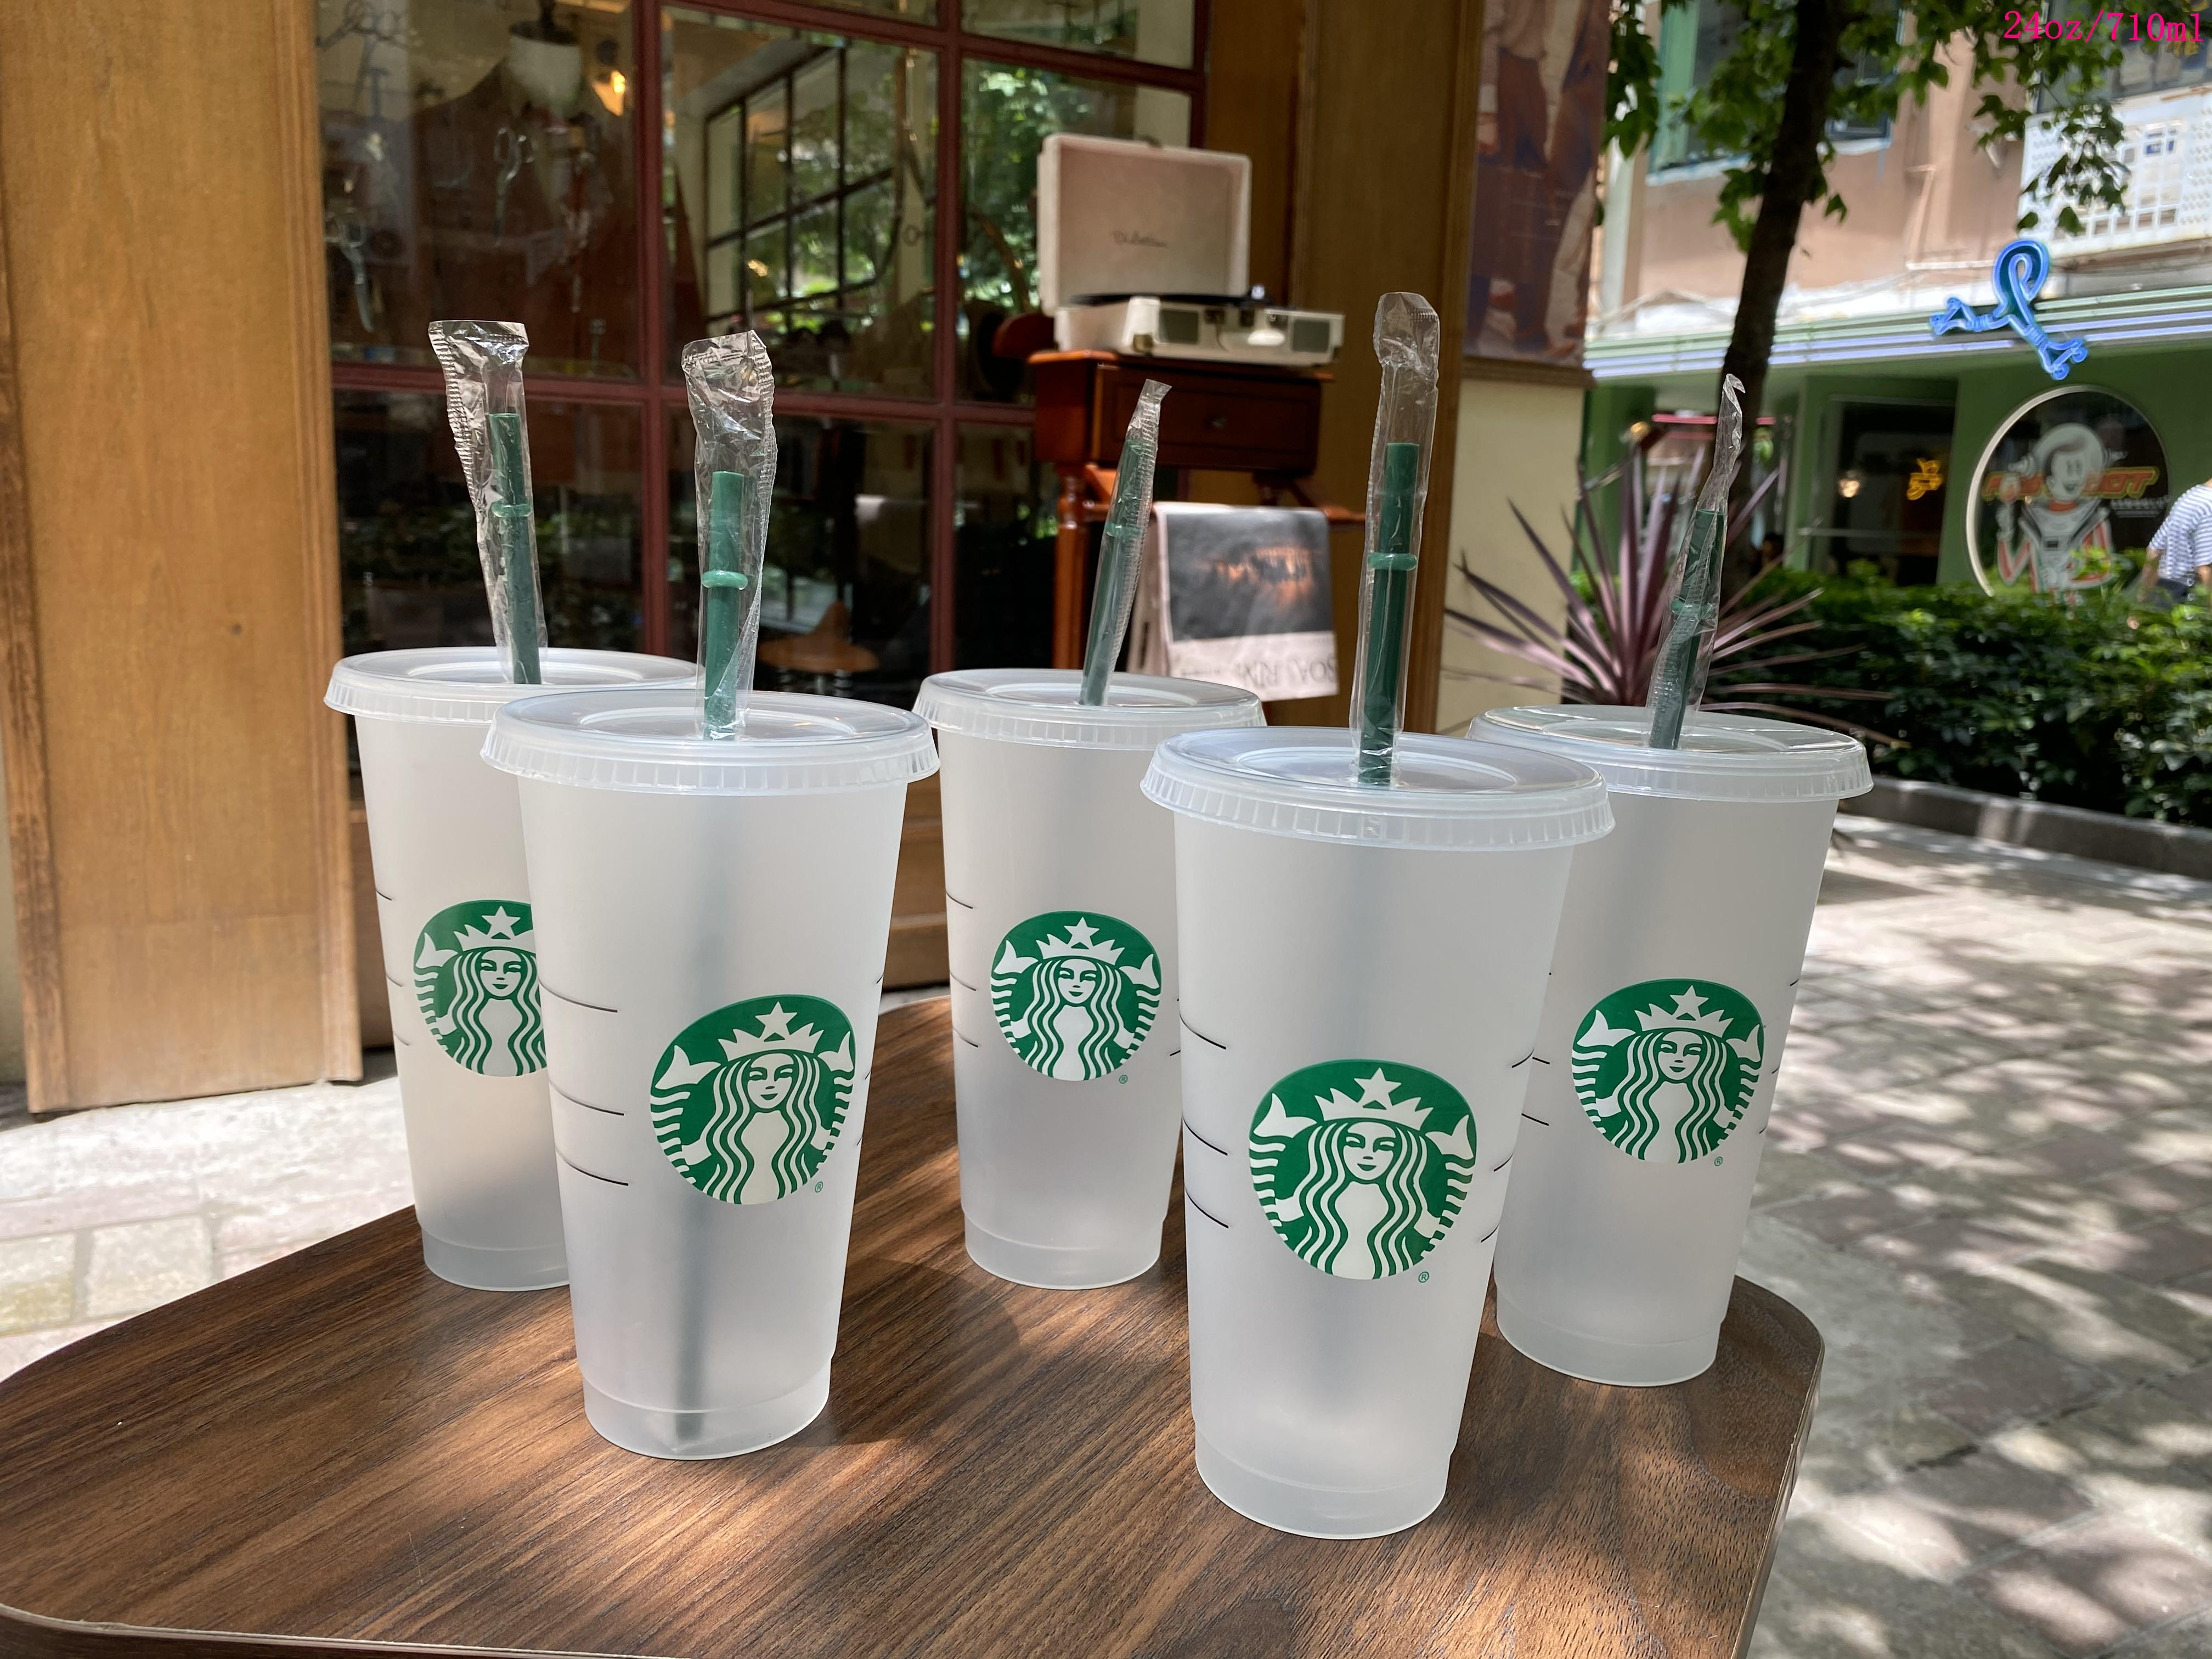 Starbucks Mermaid Goddess 24oz / 710ml Plástico Tumbler LID Reutilizável Limpar Beber Flat Bottom Pill Forma Palha Canecas Cor Mudando Flash Cups 50 pcs DHL grátis